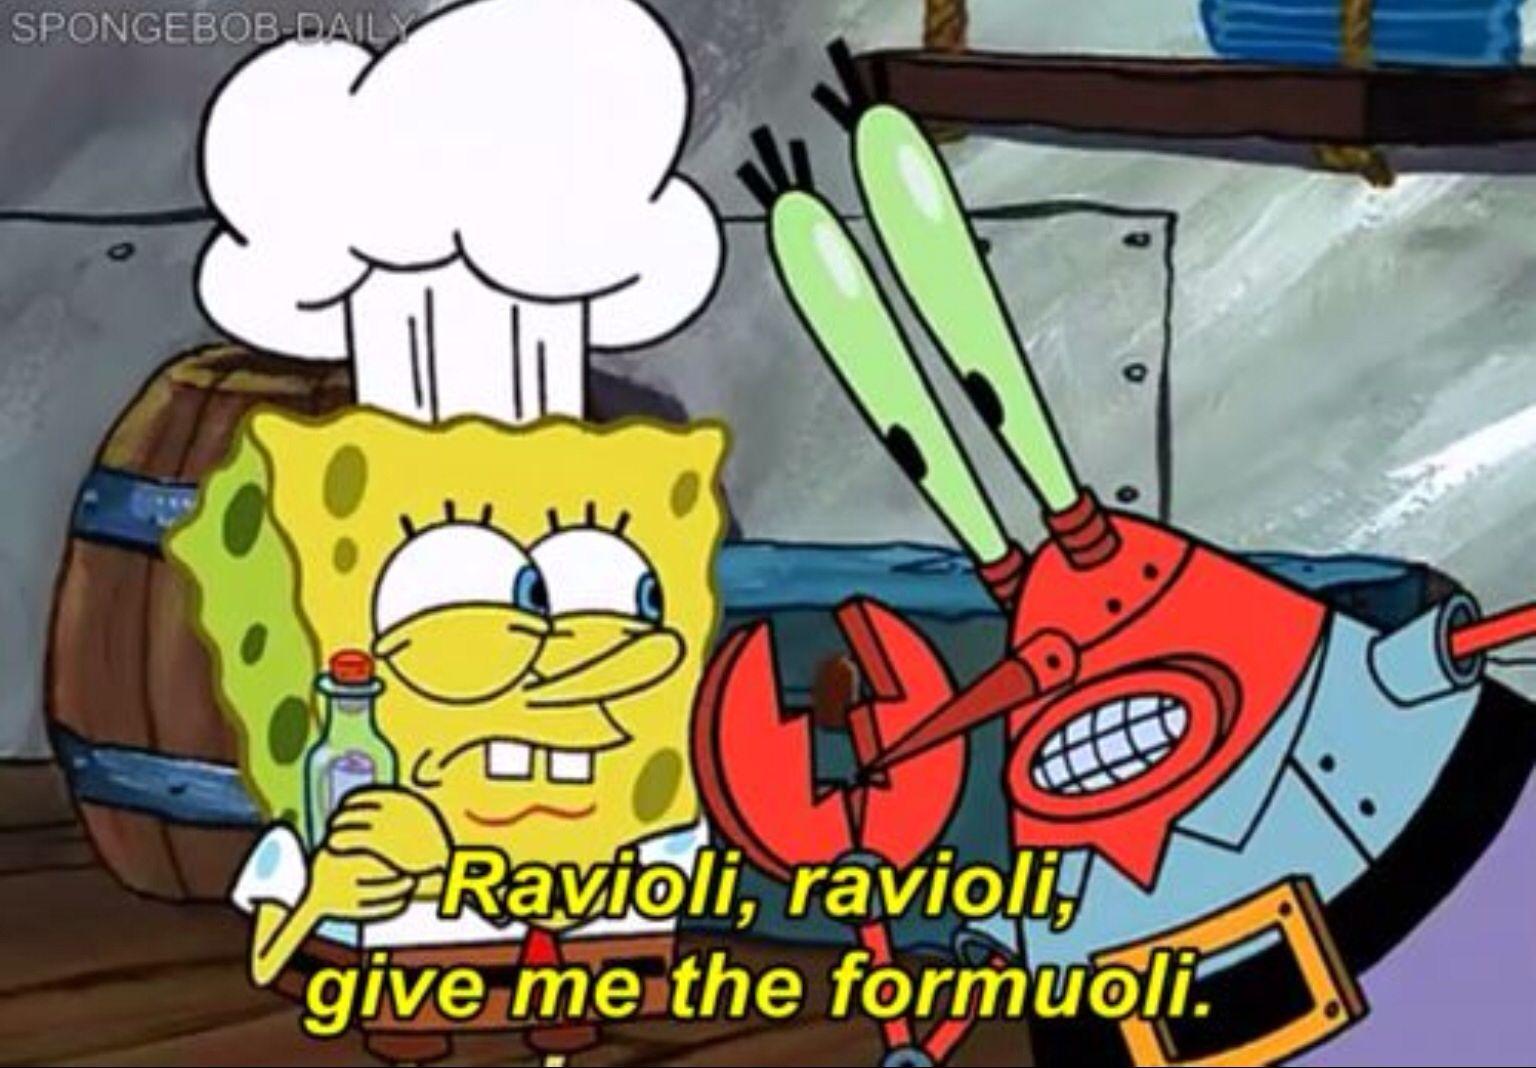 Imitation Krabs. | Spongebob, Mr krabs, Funny spongebob memes